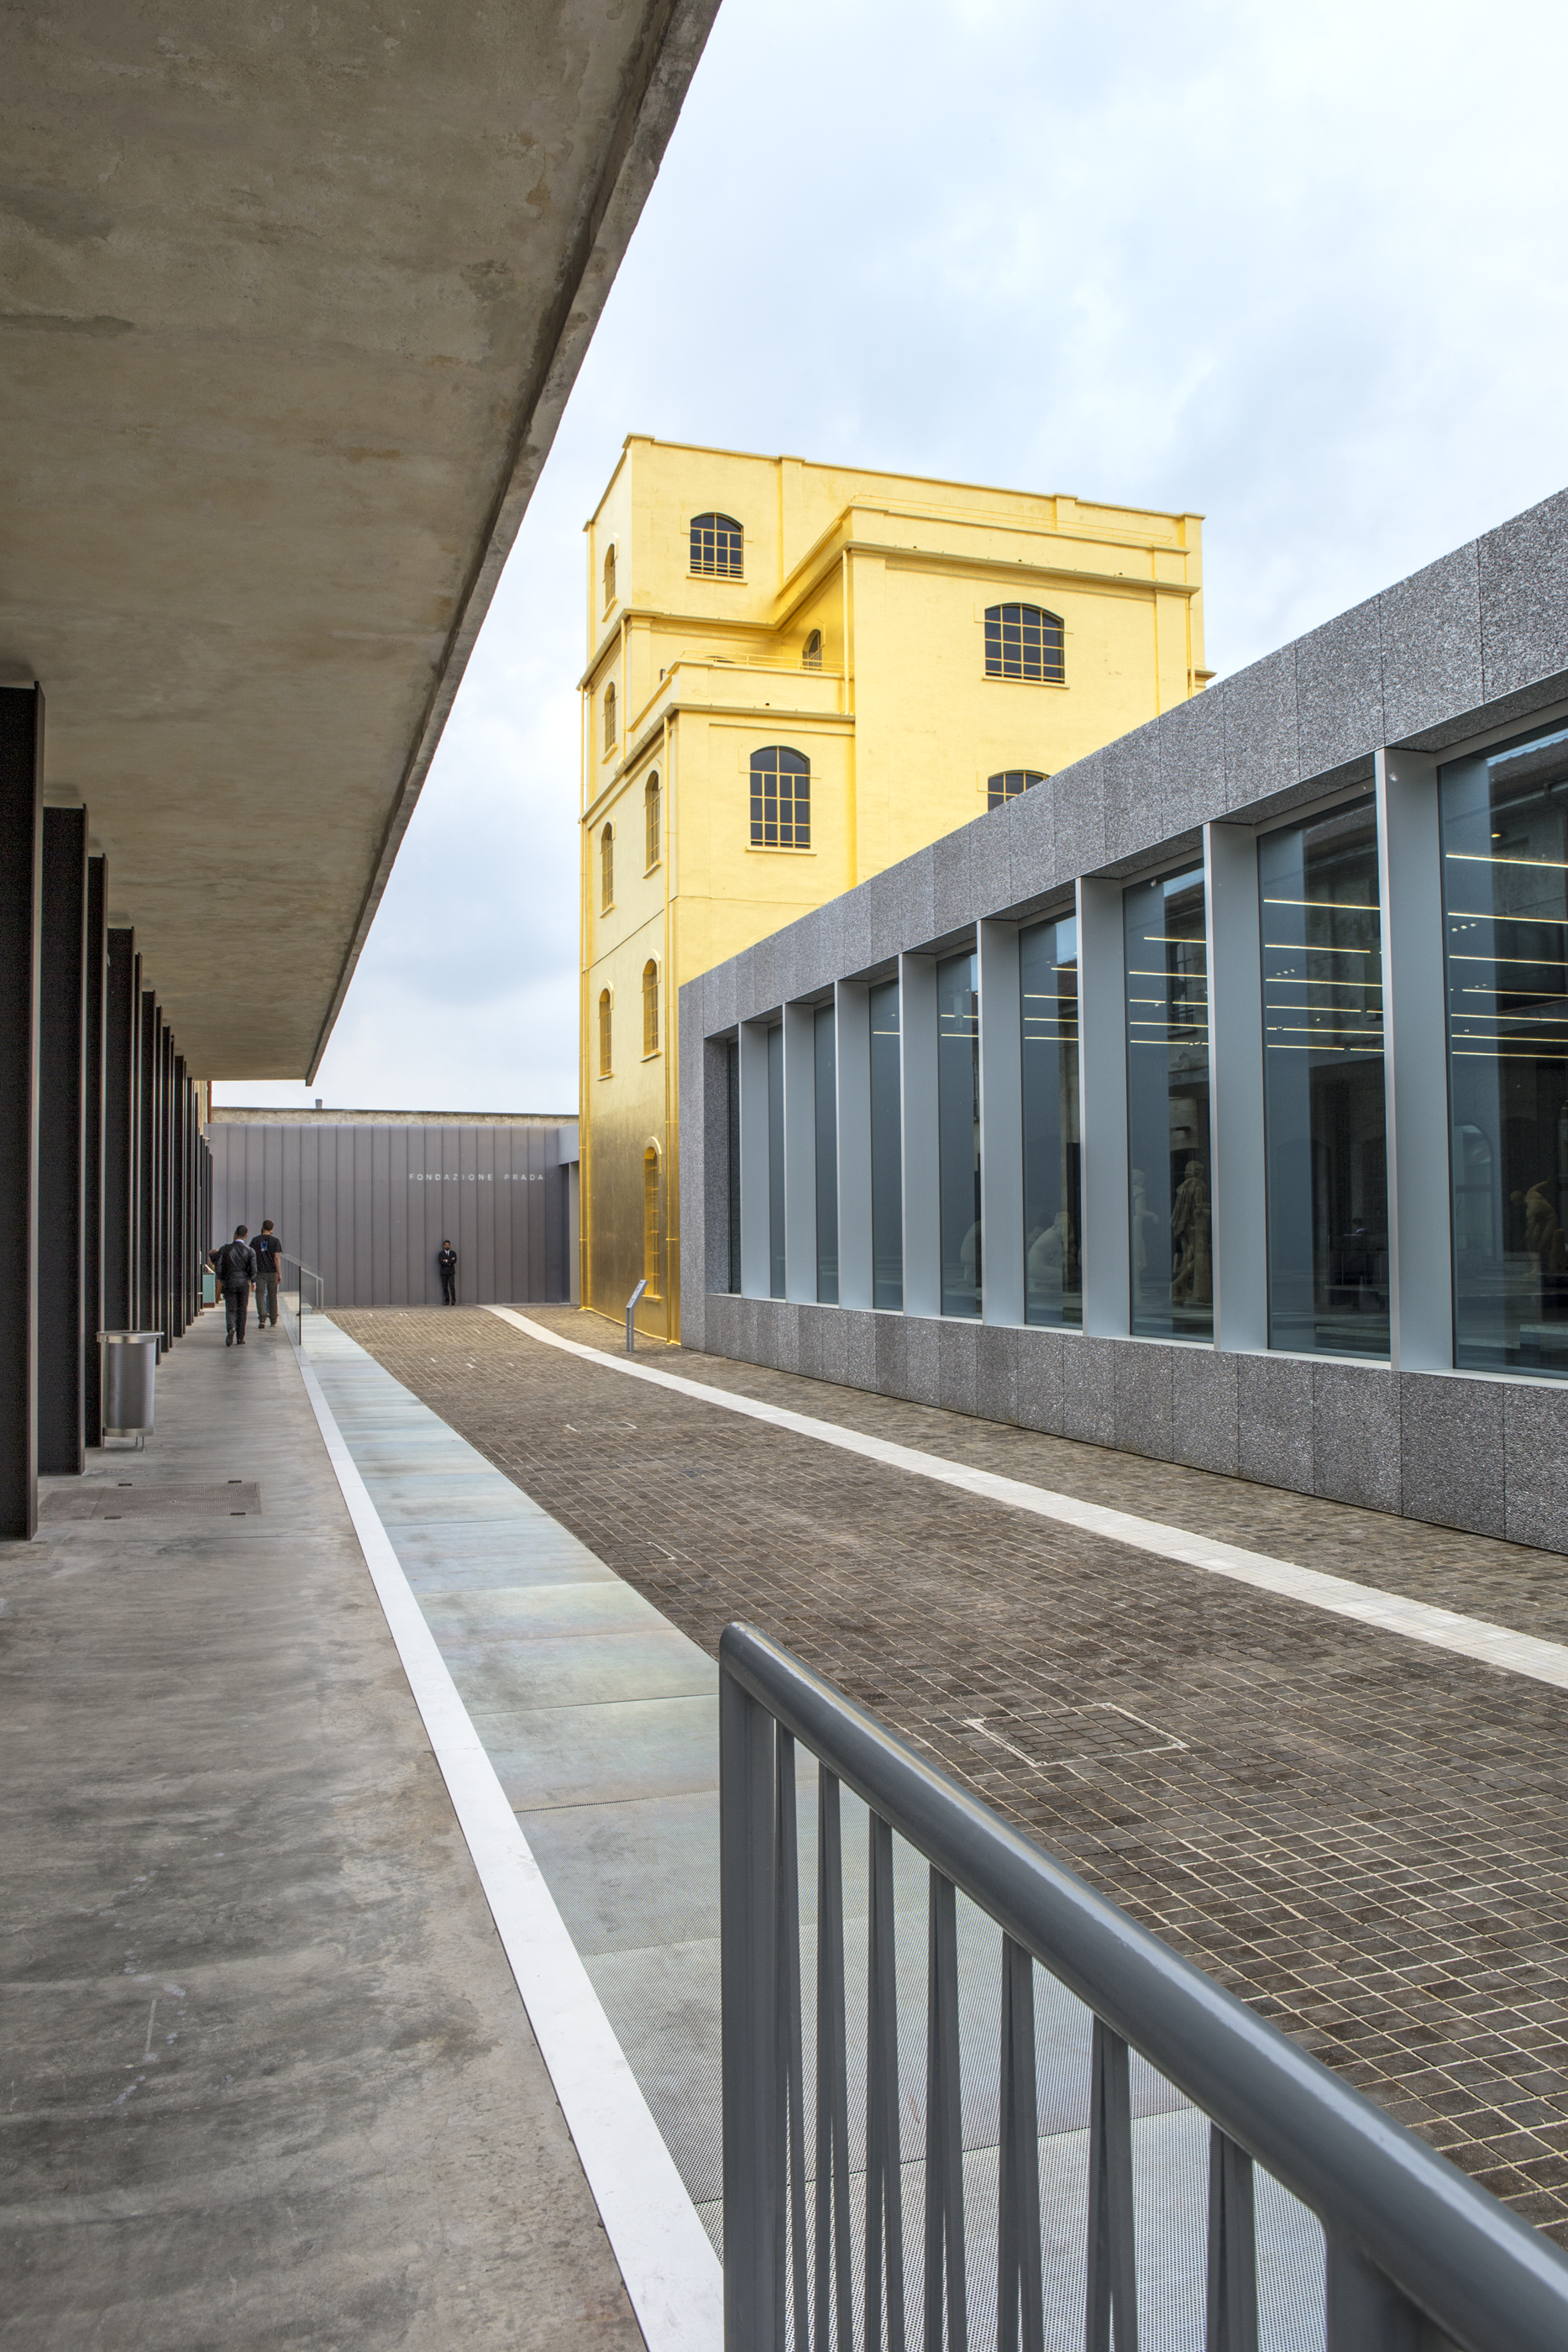 fondazione prada designed by rem koolhaas